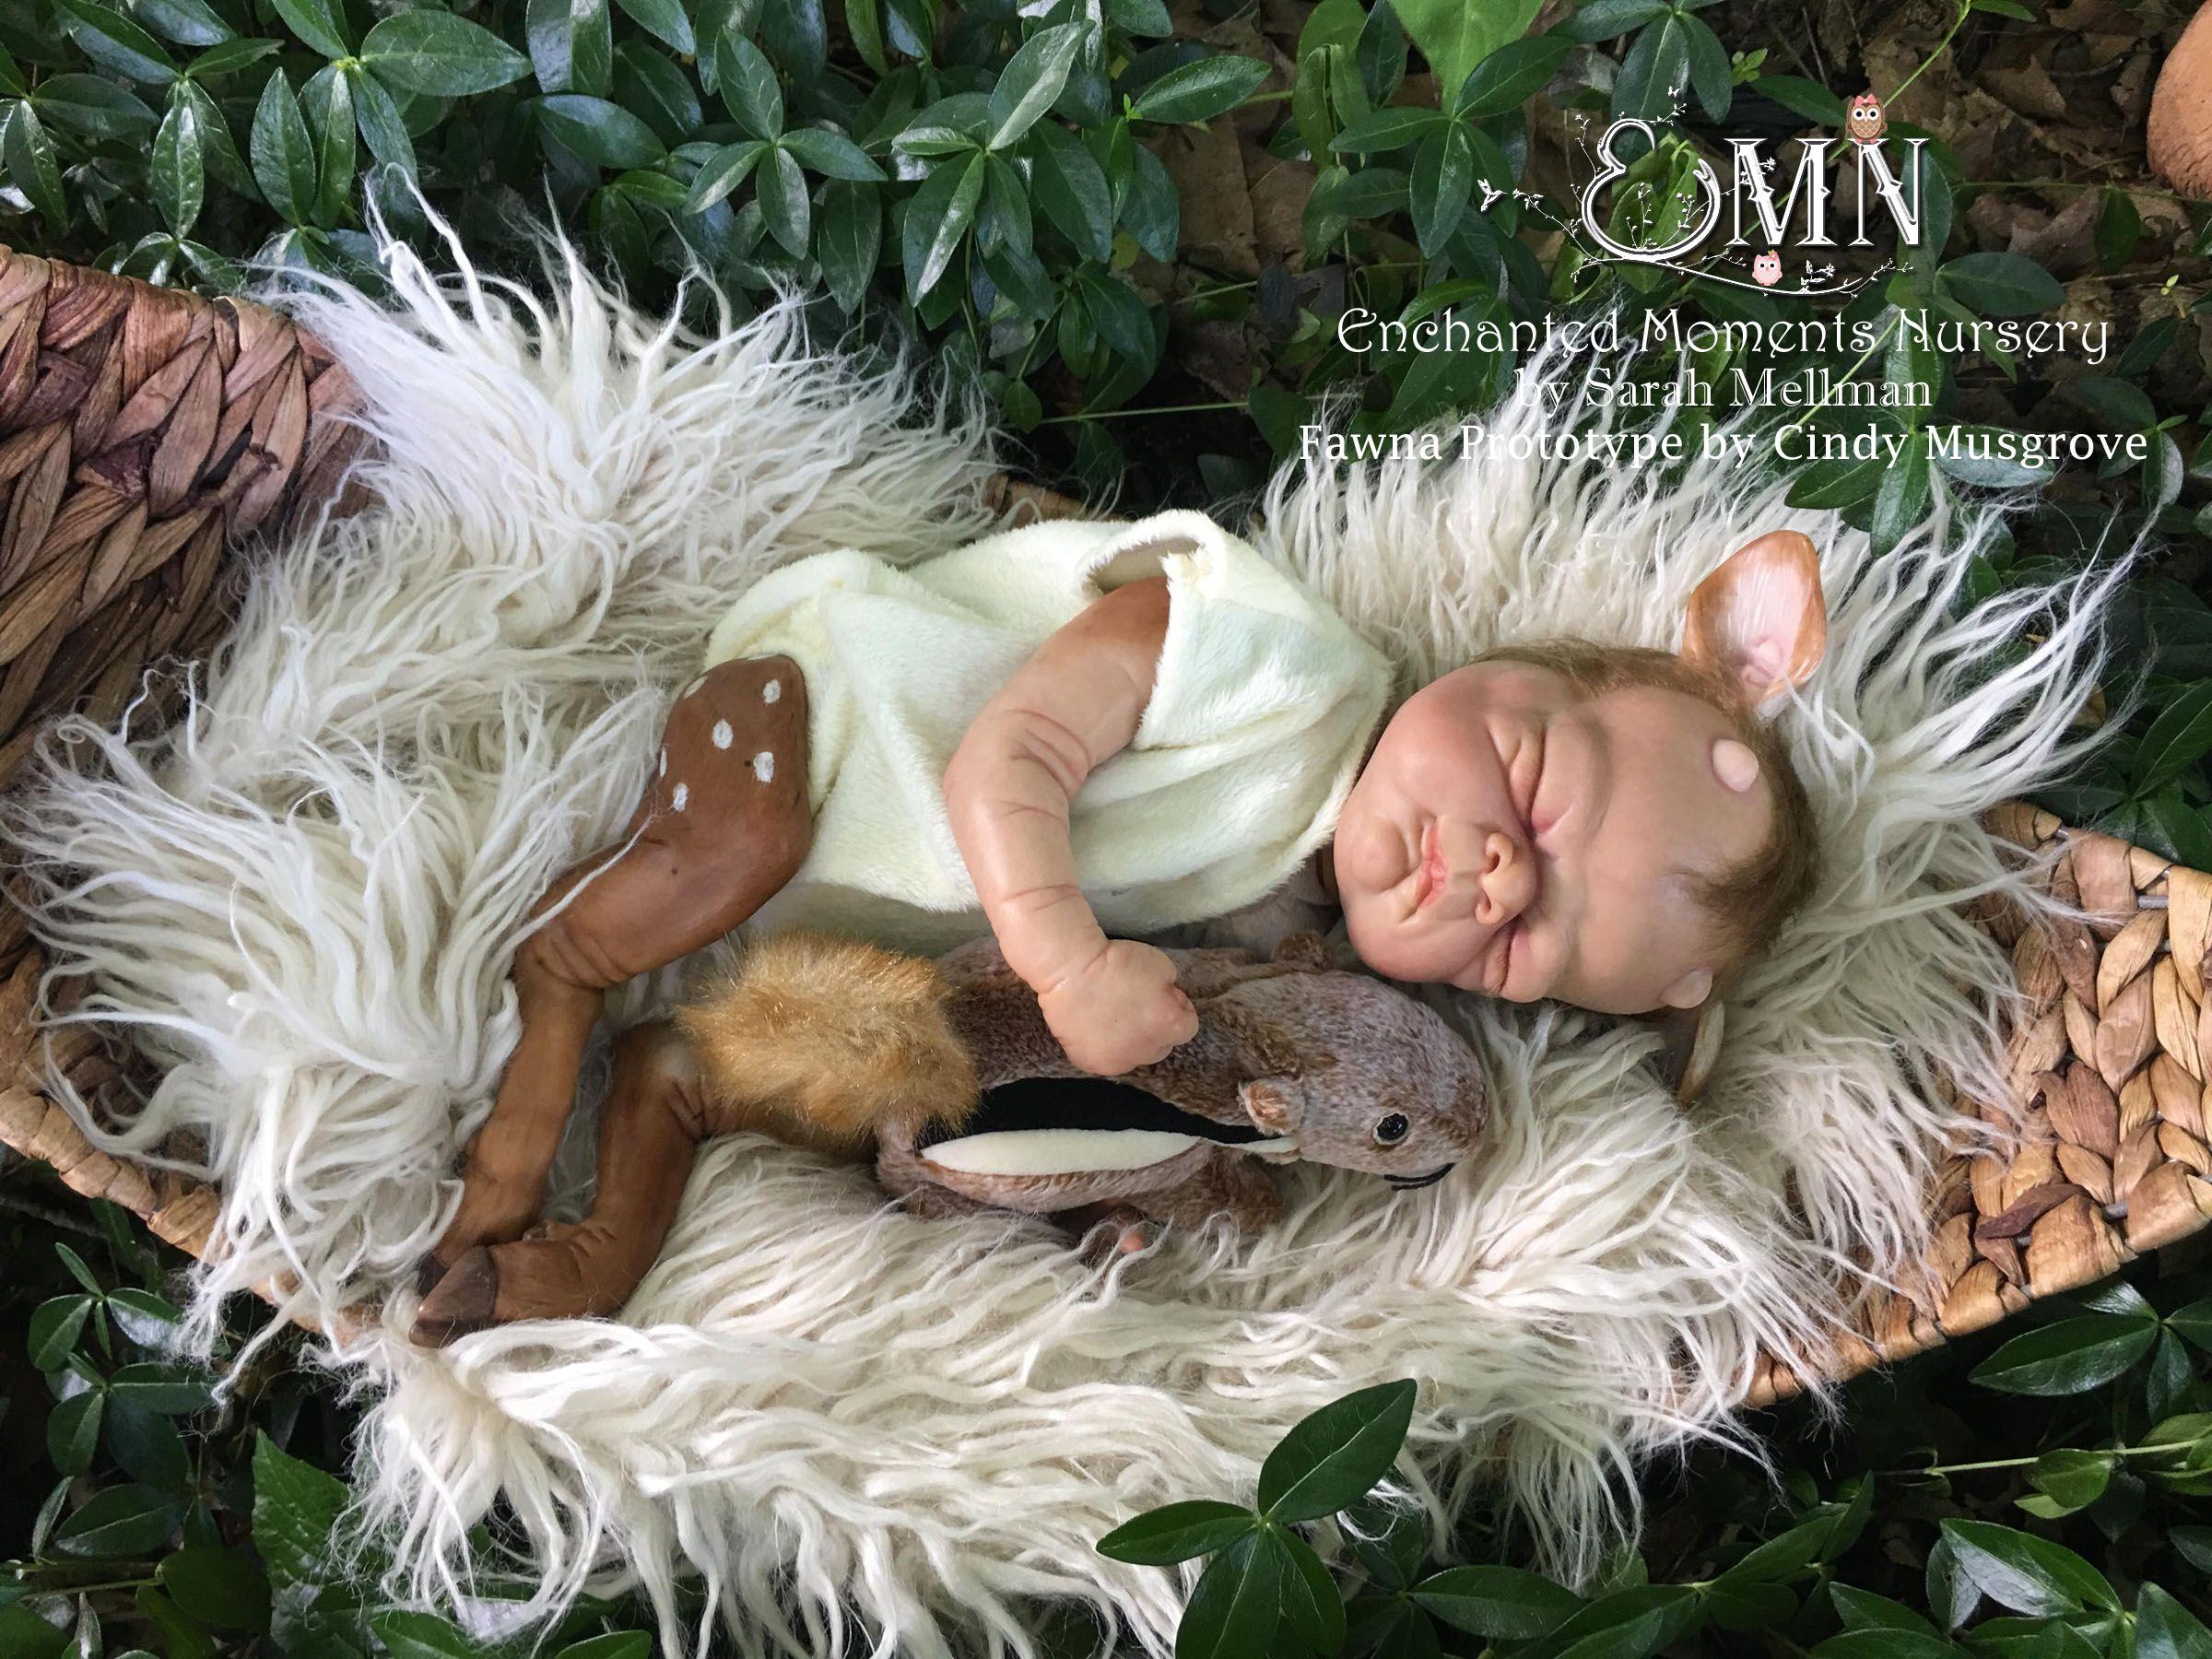 Fawna pre-verniciato Reborn Kit By Cindy Musgrove